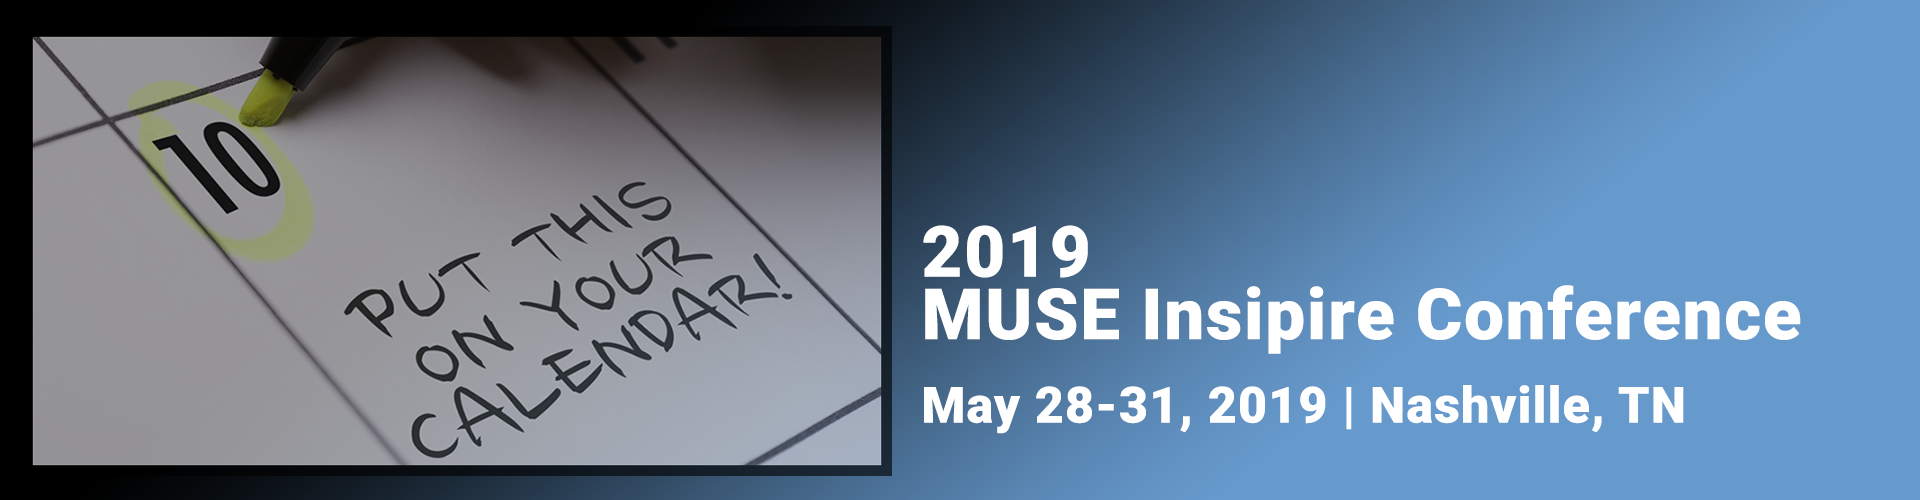 Calendar-Notice-Header-MUSE